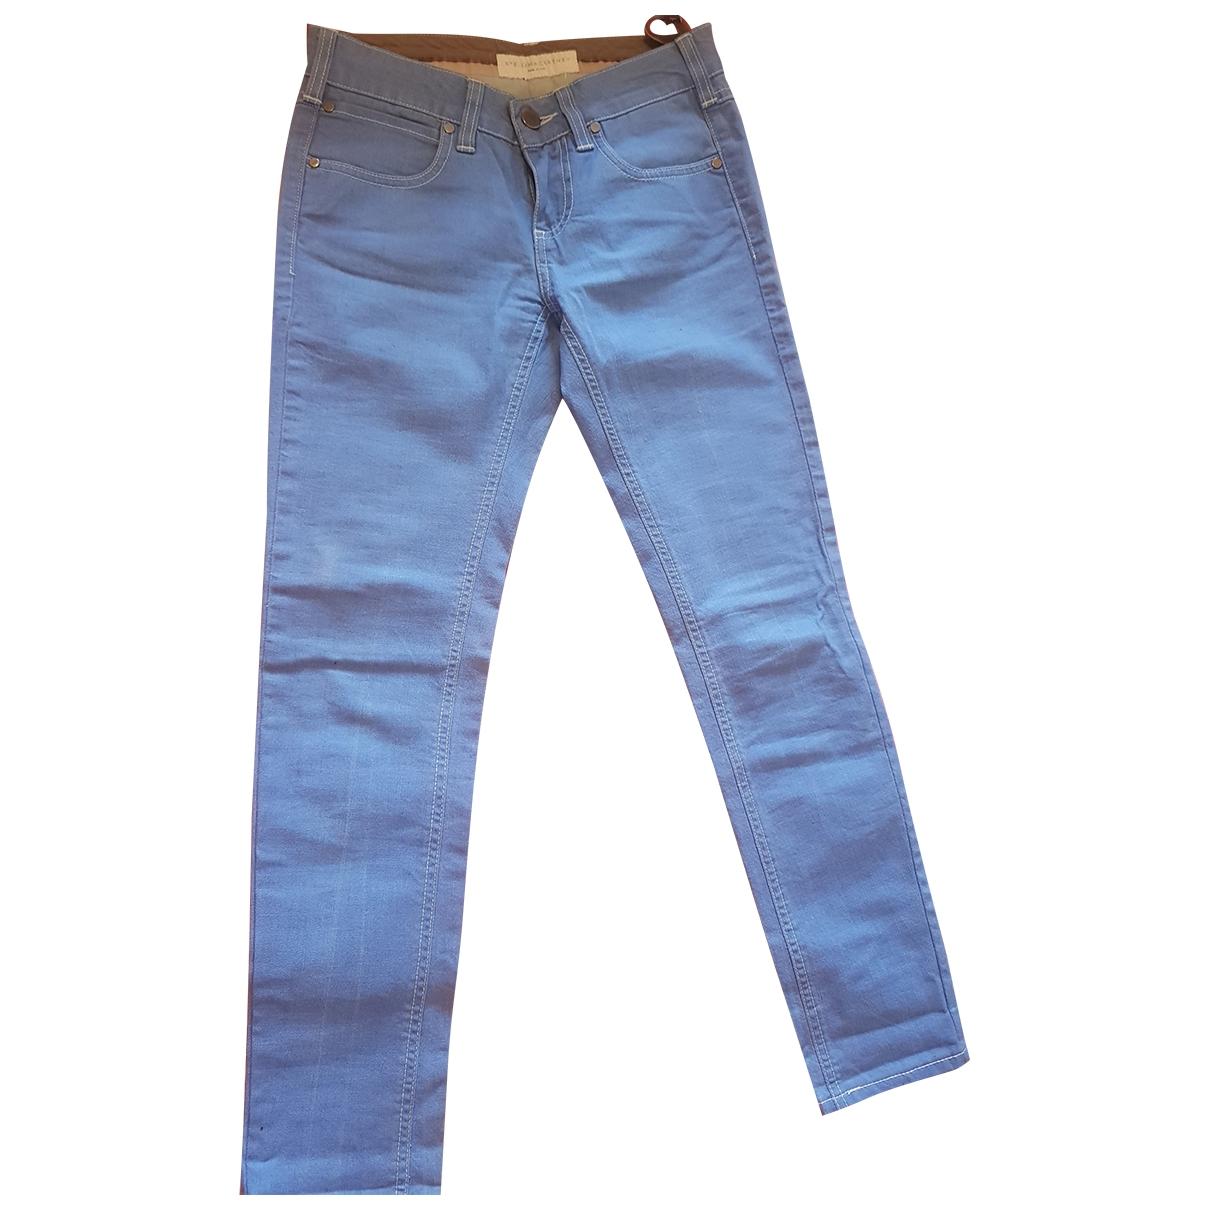 Stella Mccartney \N Blue Cotton Jeans for Women 25 US